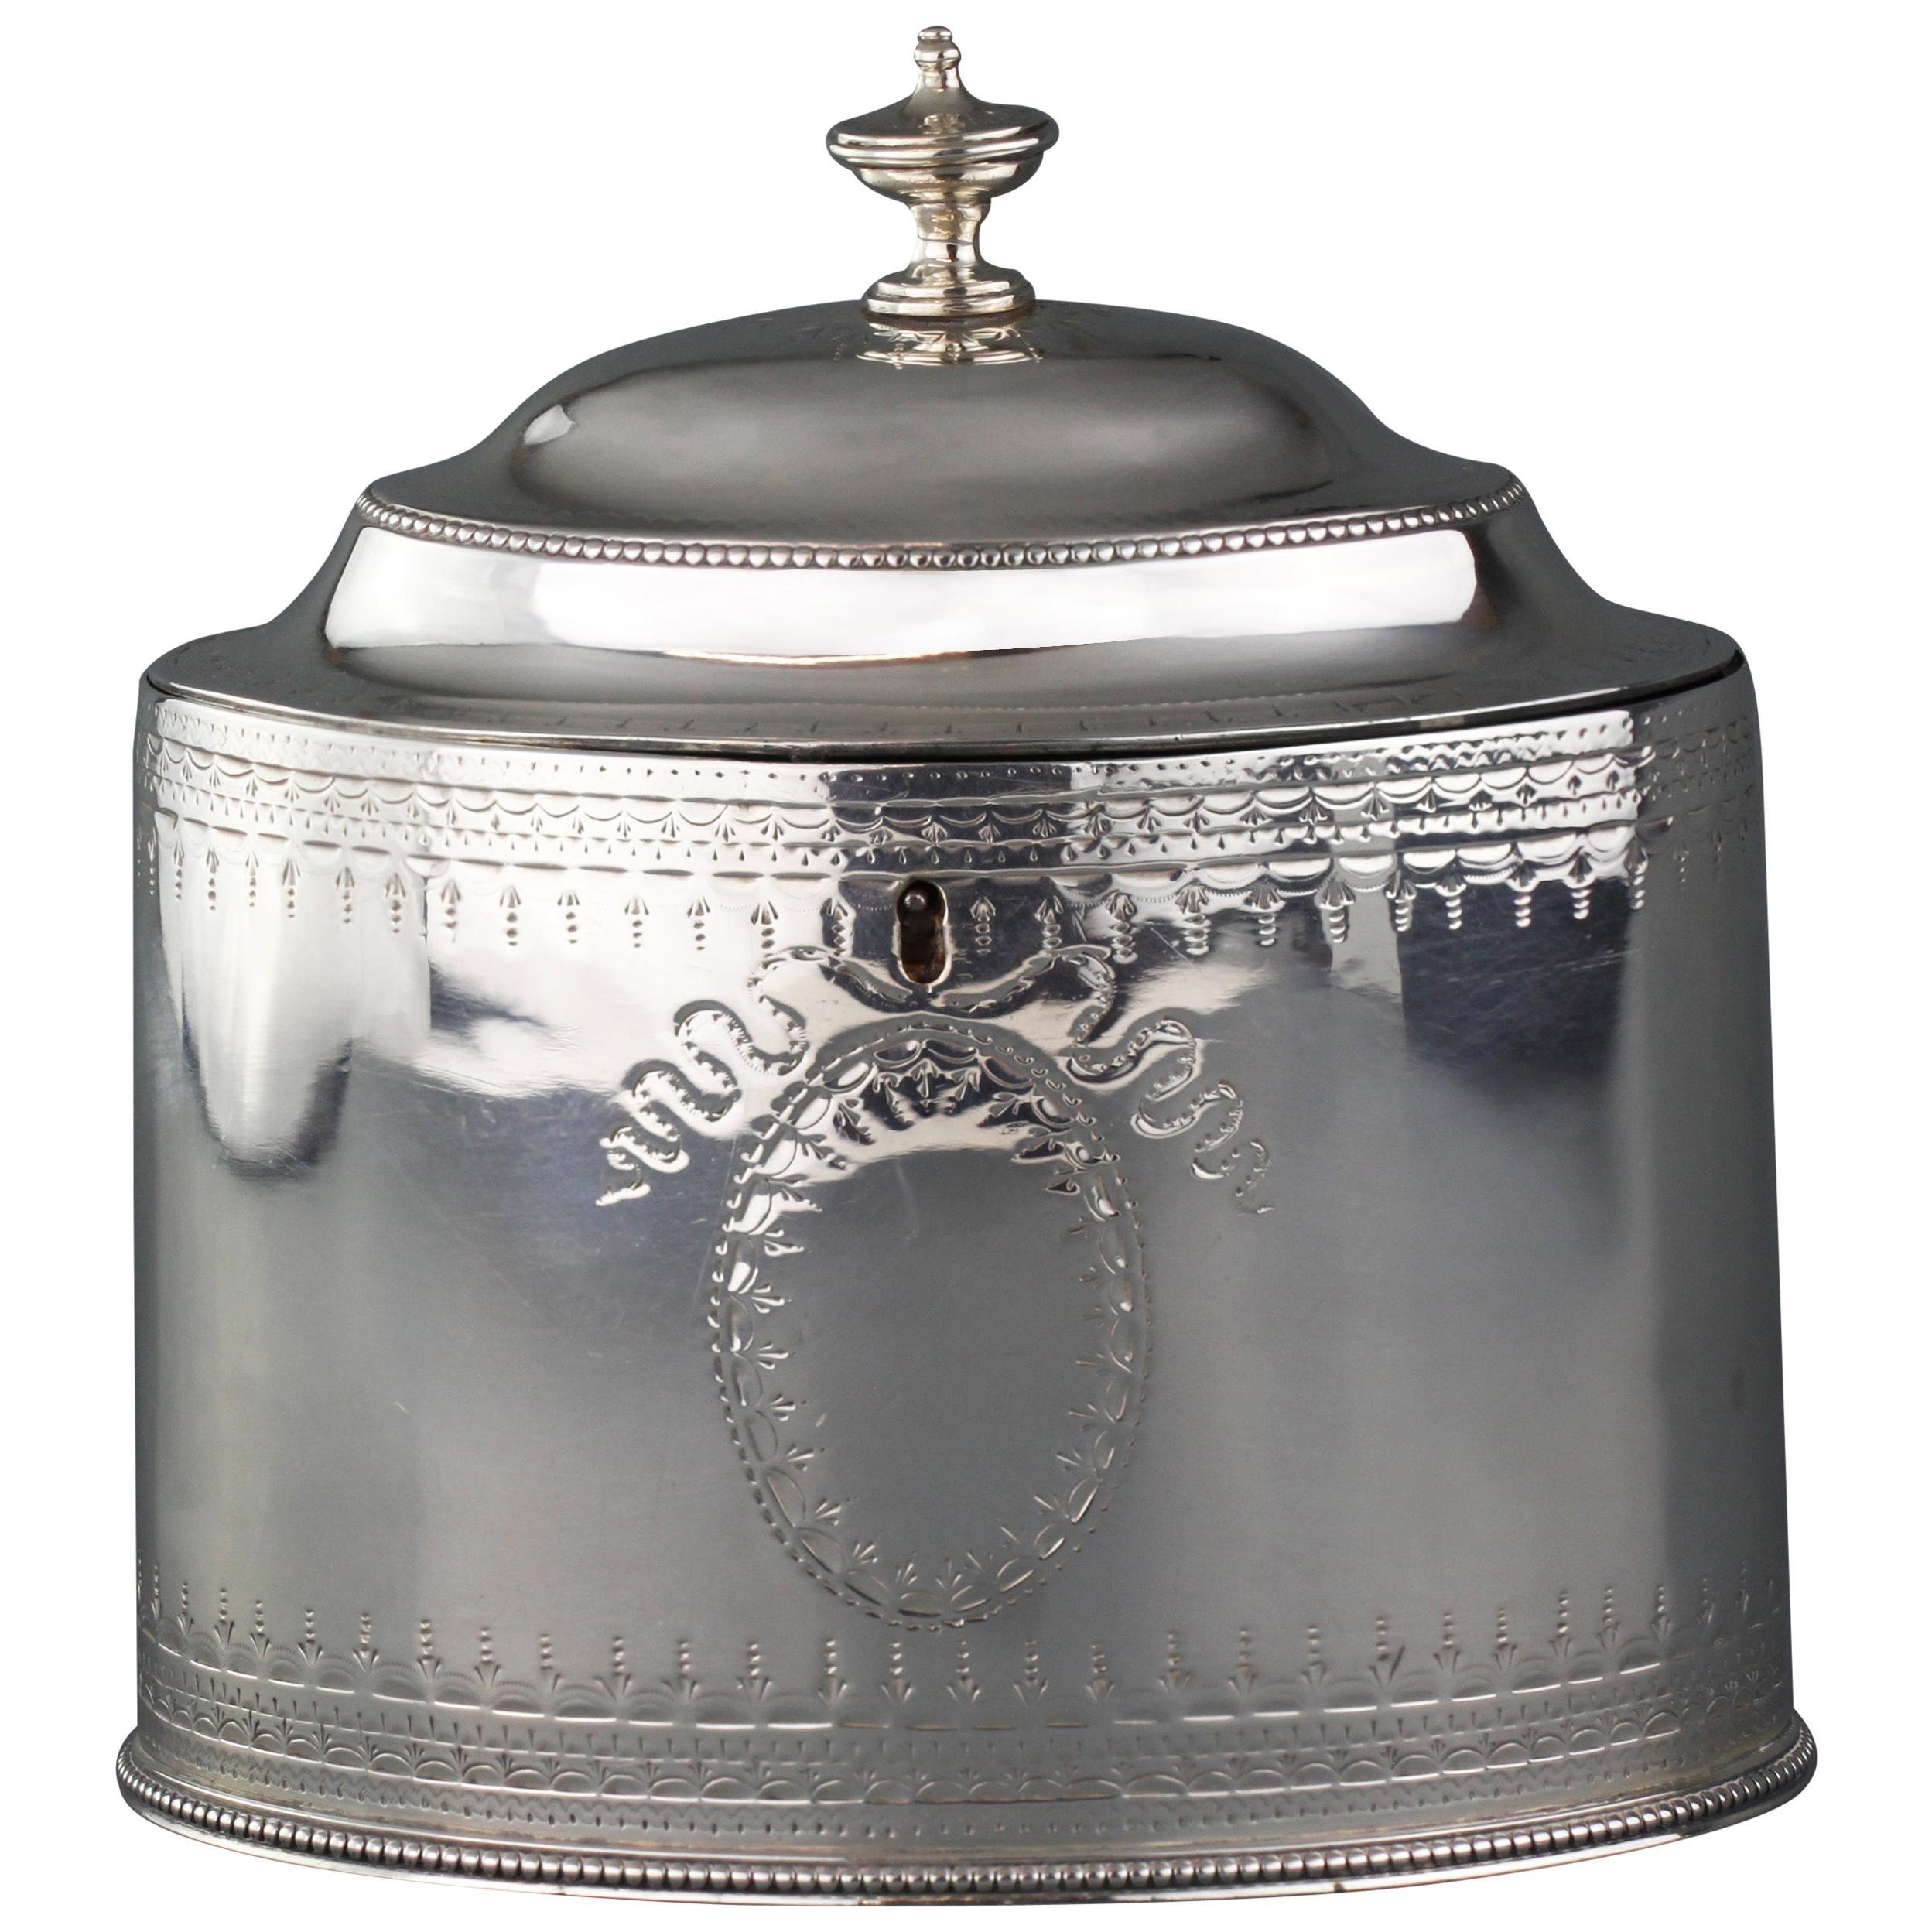 Antique Georgian Sterling Silver Tea Caddy, Hester Bateman, London, 1784